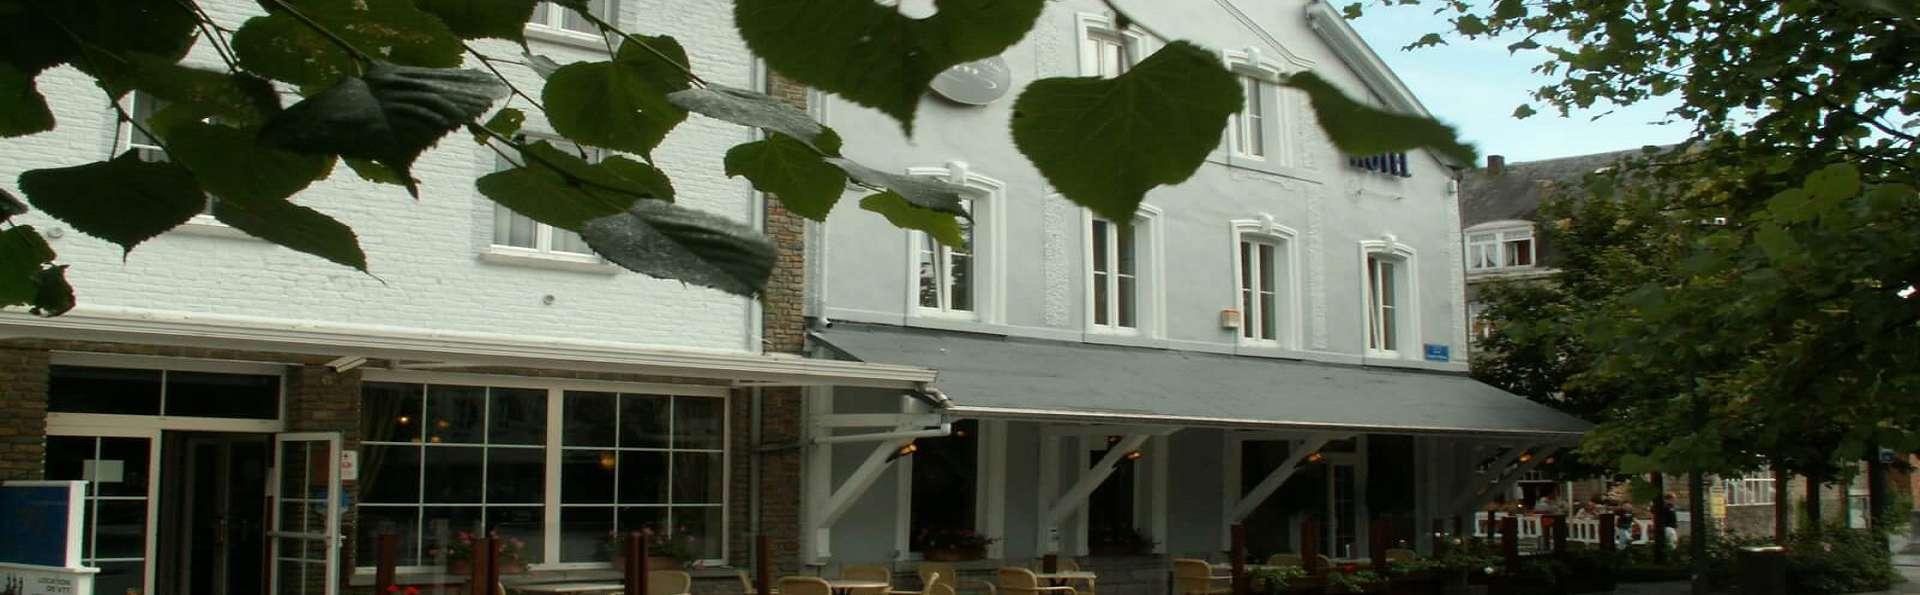 Cocoon Hotel Grenier des Grottes - co1.jpg